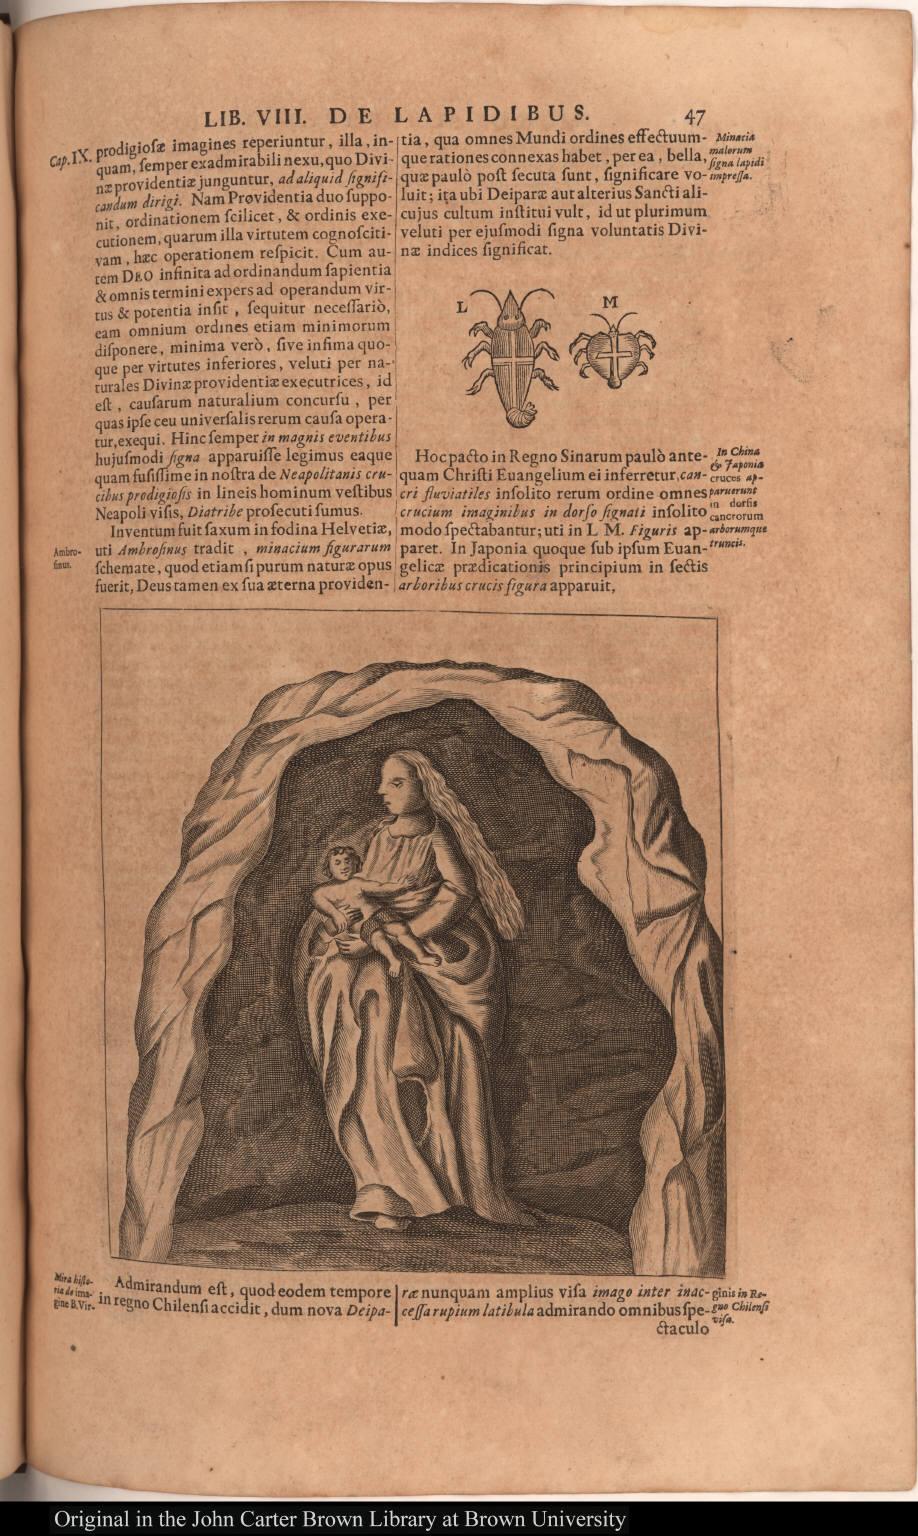 [Mira historia de imagine B. Virginis in Regno Chilense visa.]